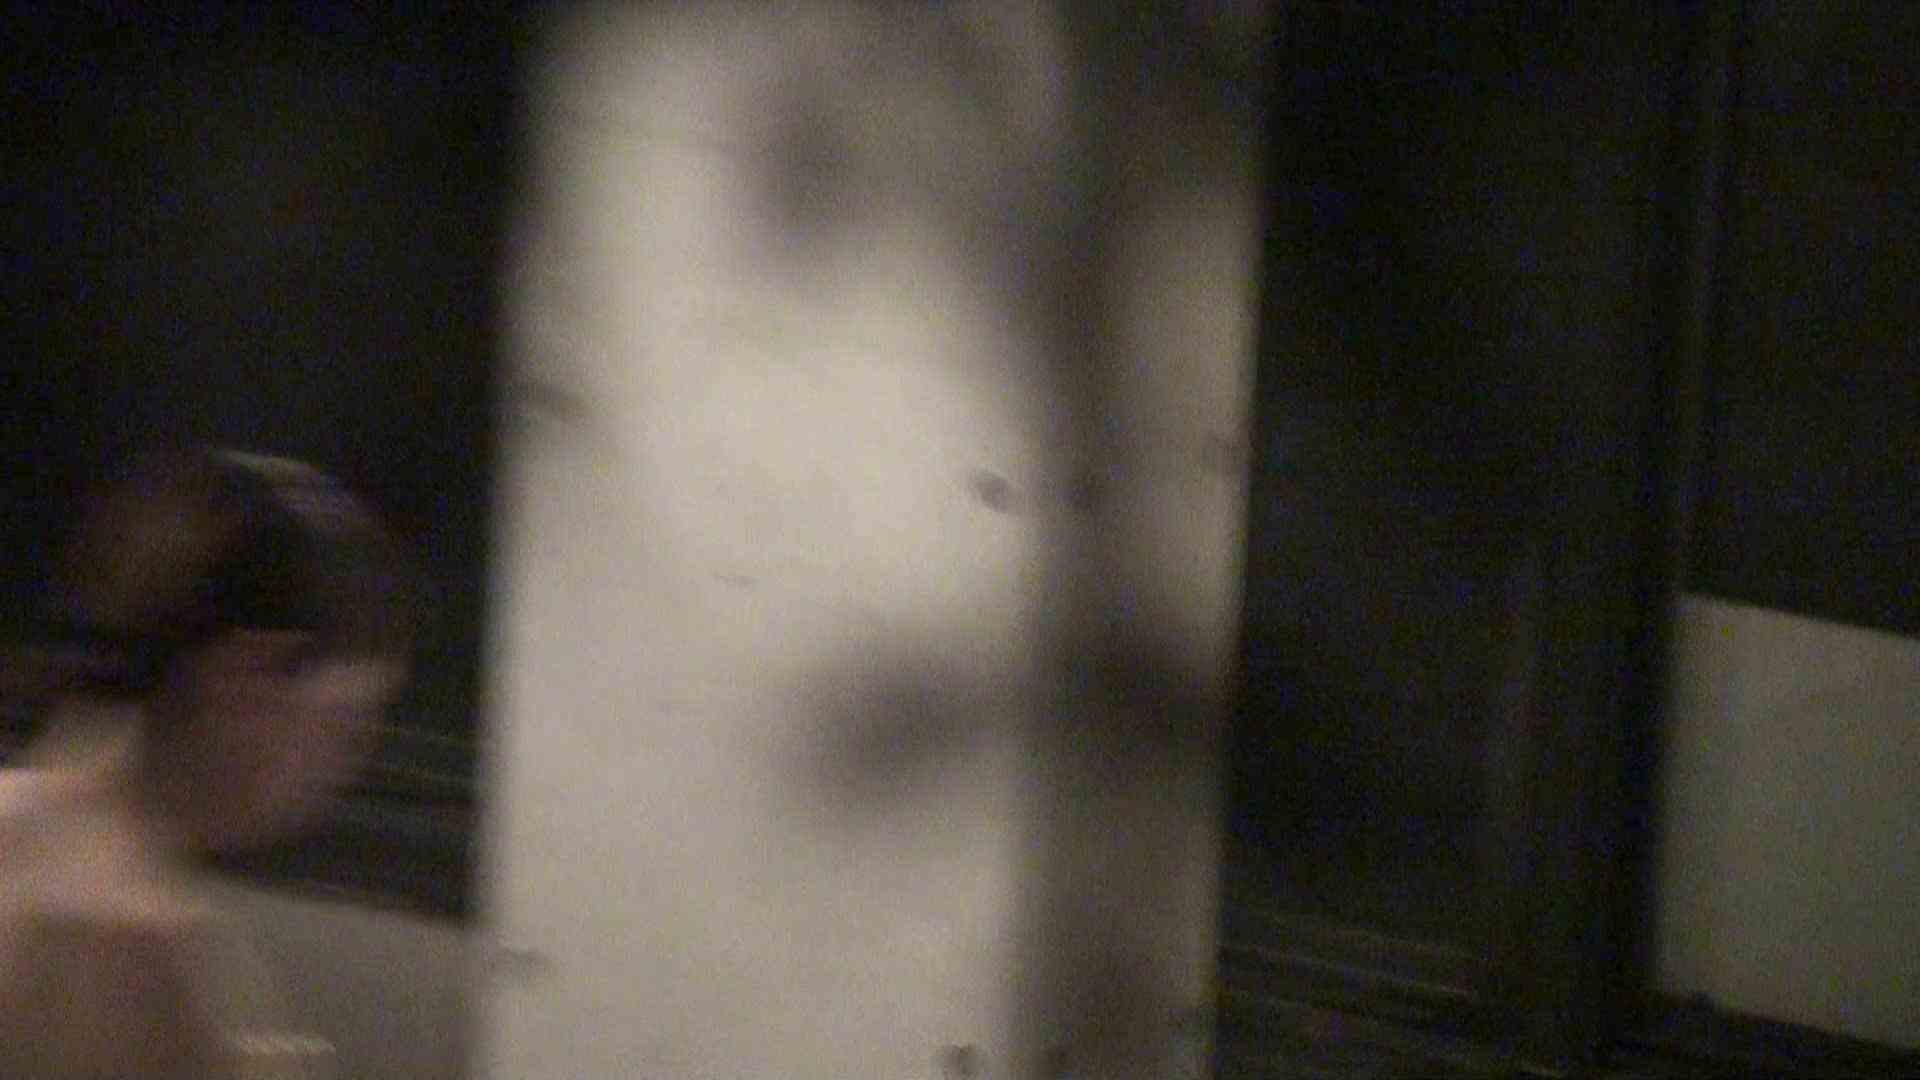 Aquaな露天風呂Vol.426 OLセックス 盗み撮りオマンコ動画キャプチャ 106画像 11